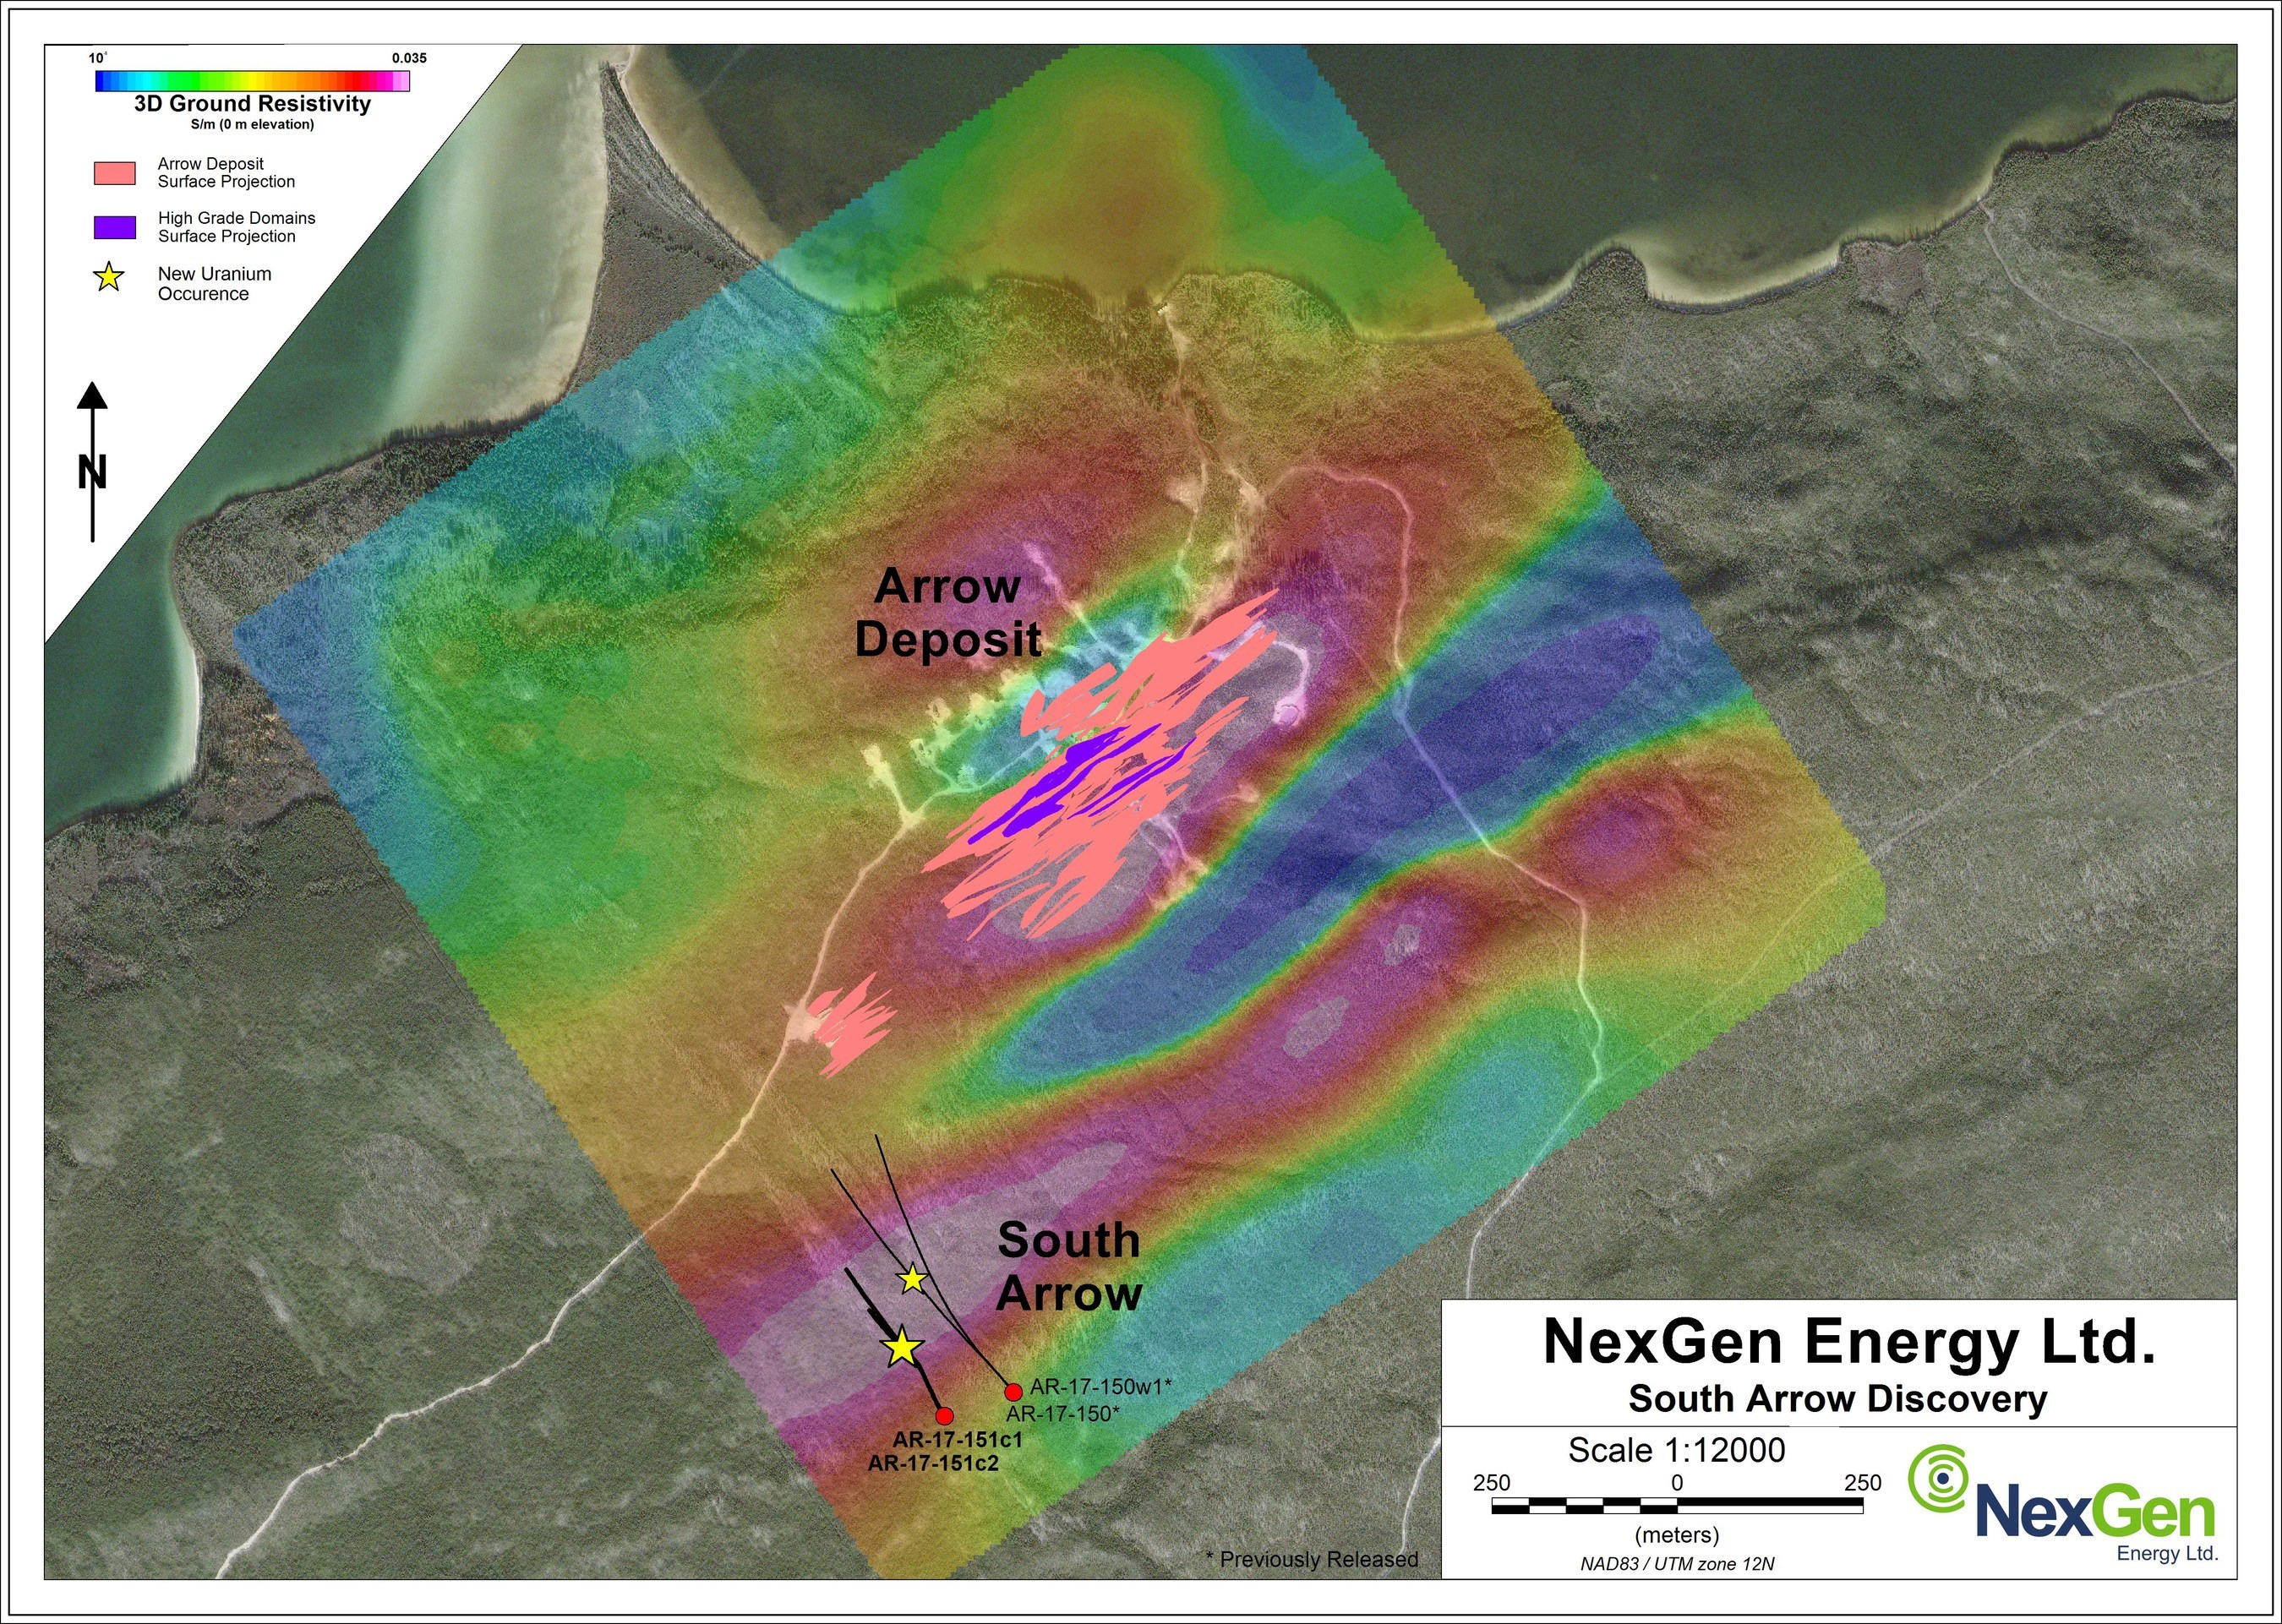 Figure 1: South Arrow Drill Hole Locations (CNW Group/NexGen Energy Ltd.)